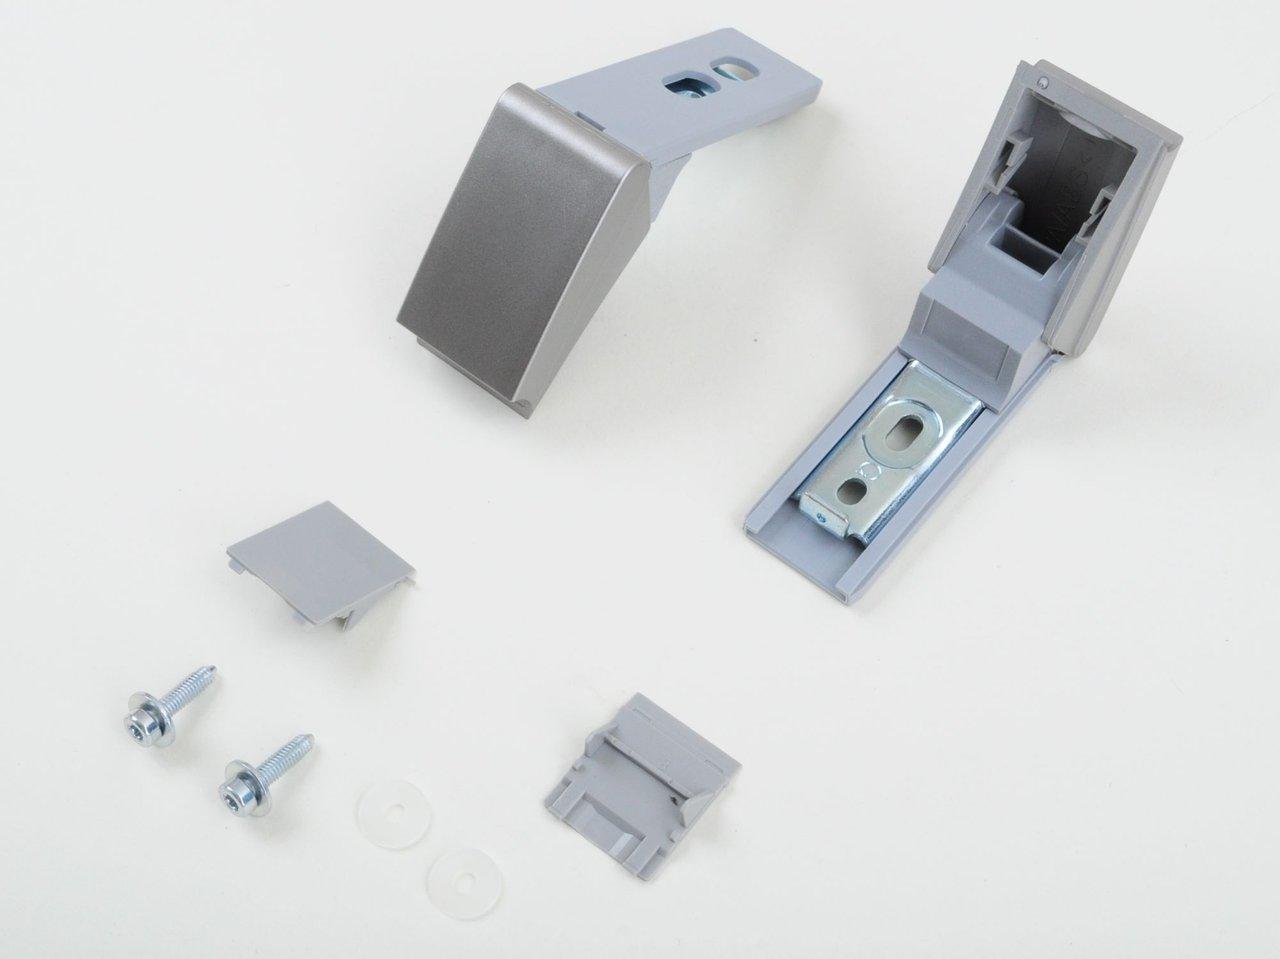 Bosch Kühlschrank Classic Edition Ersatzteile : Liebherr türgriff scharnier kühlschrank original rep. set 9590178